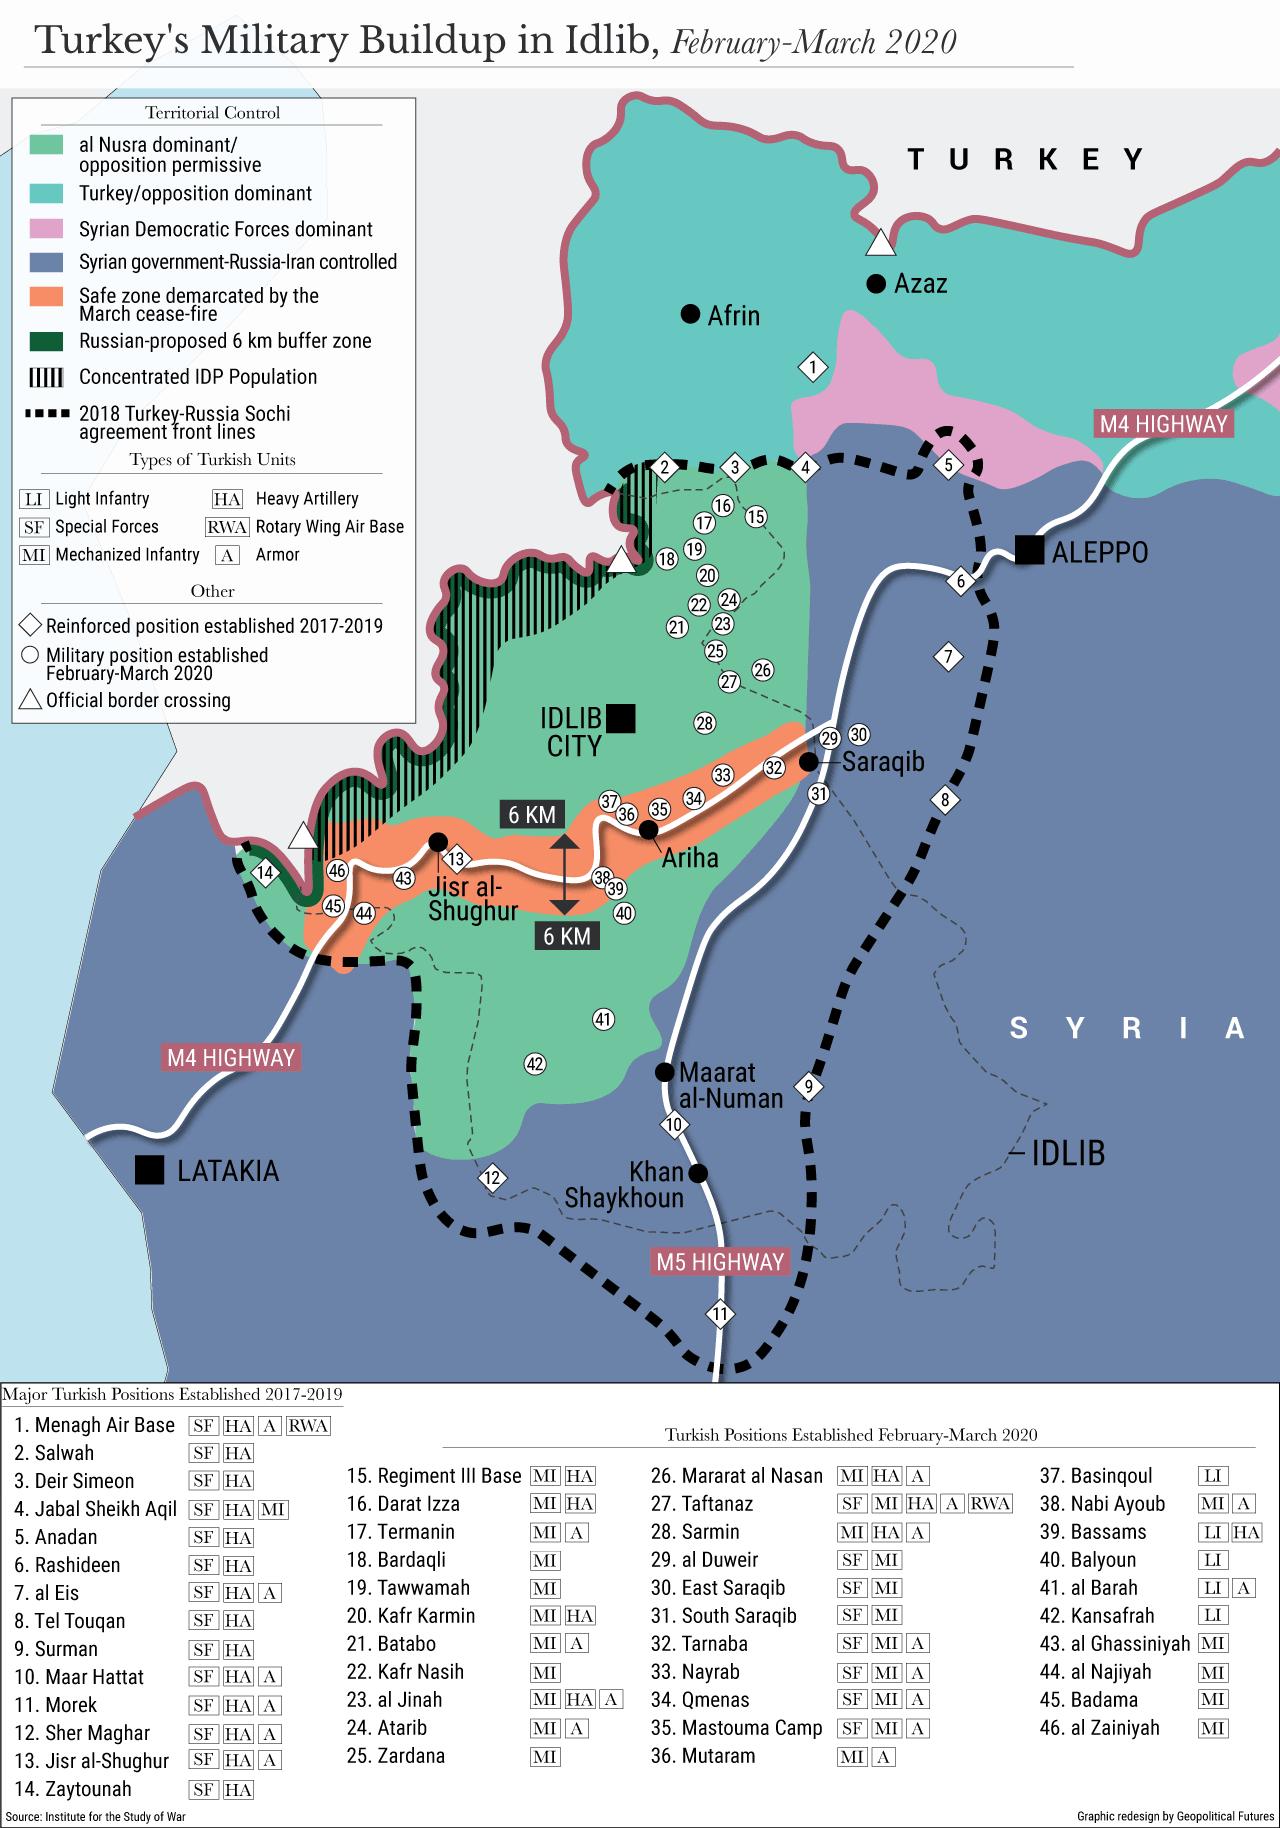 Turkey's Military Buildup in Idlib, February-March 2020